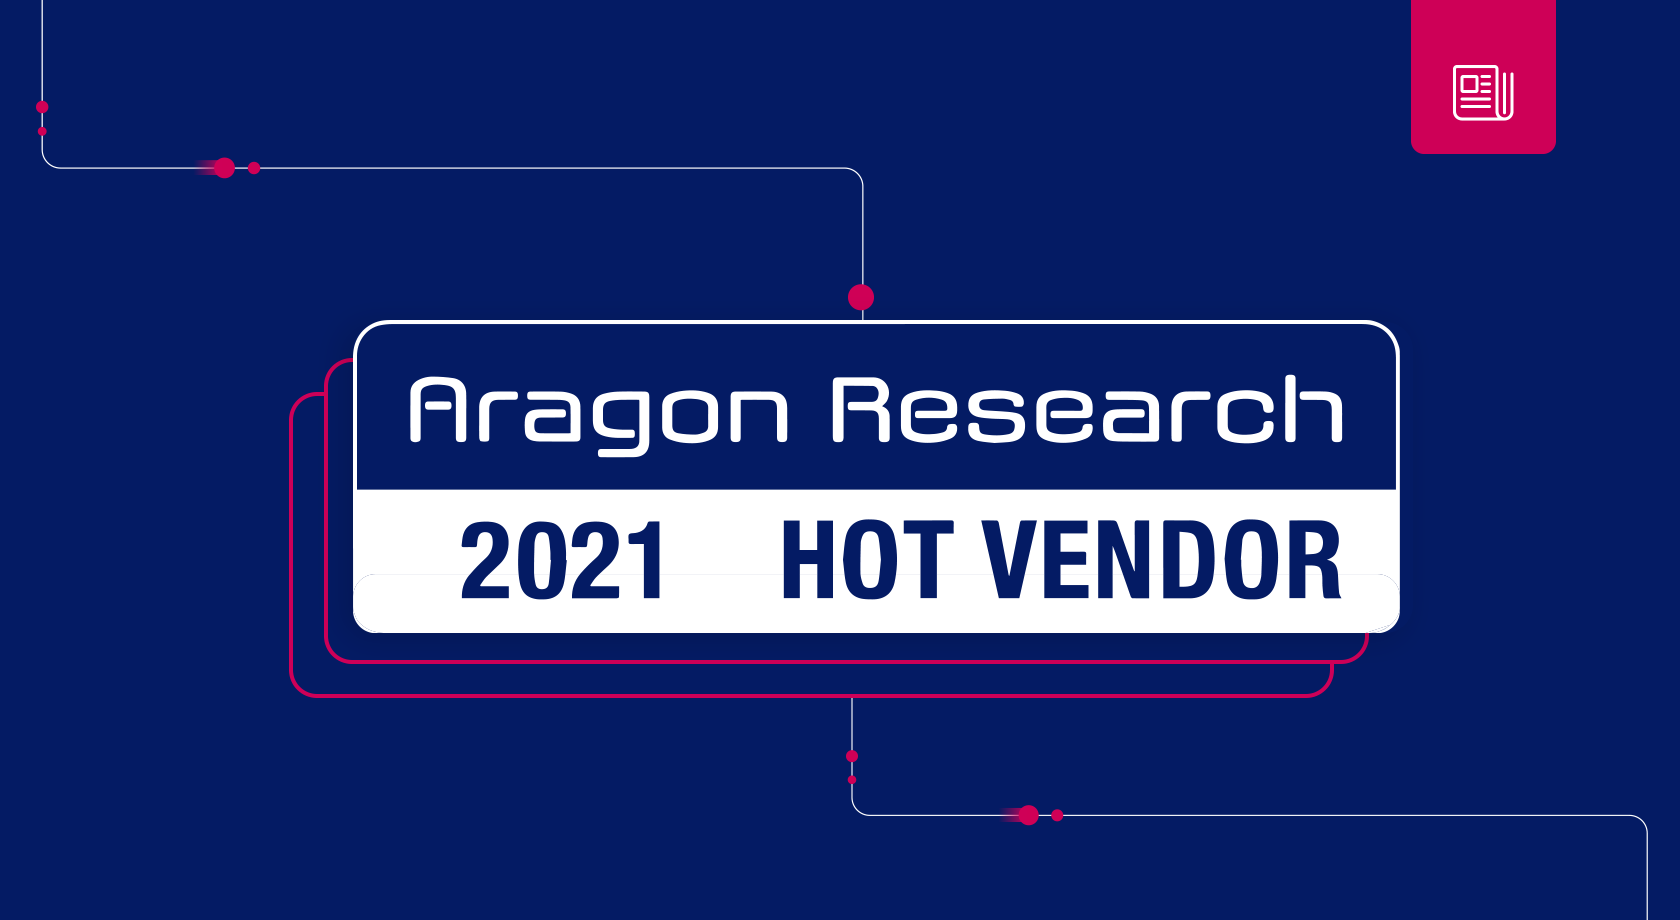 Uberflip named 2021 hot vendor by Aragon Research